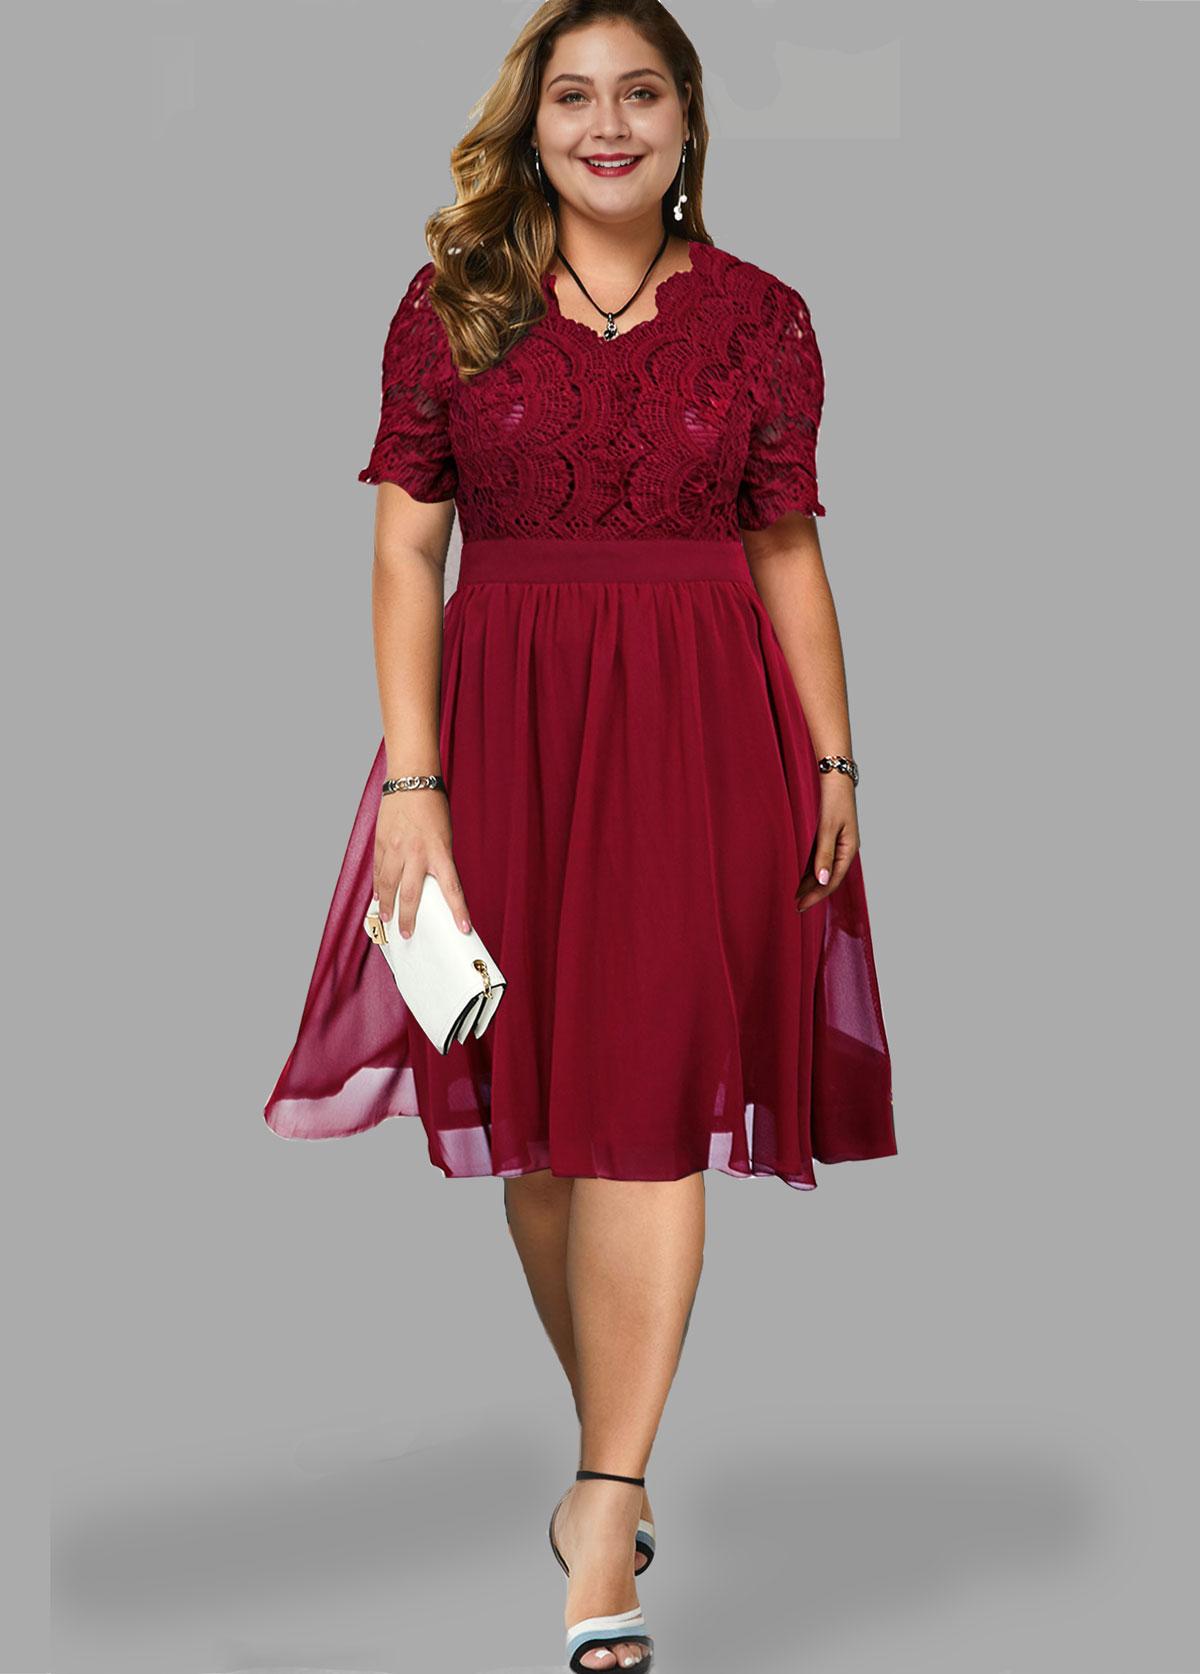 Lace Panel Short Sleeve Plus Size Dress